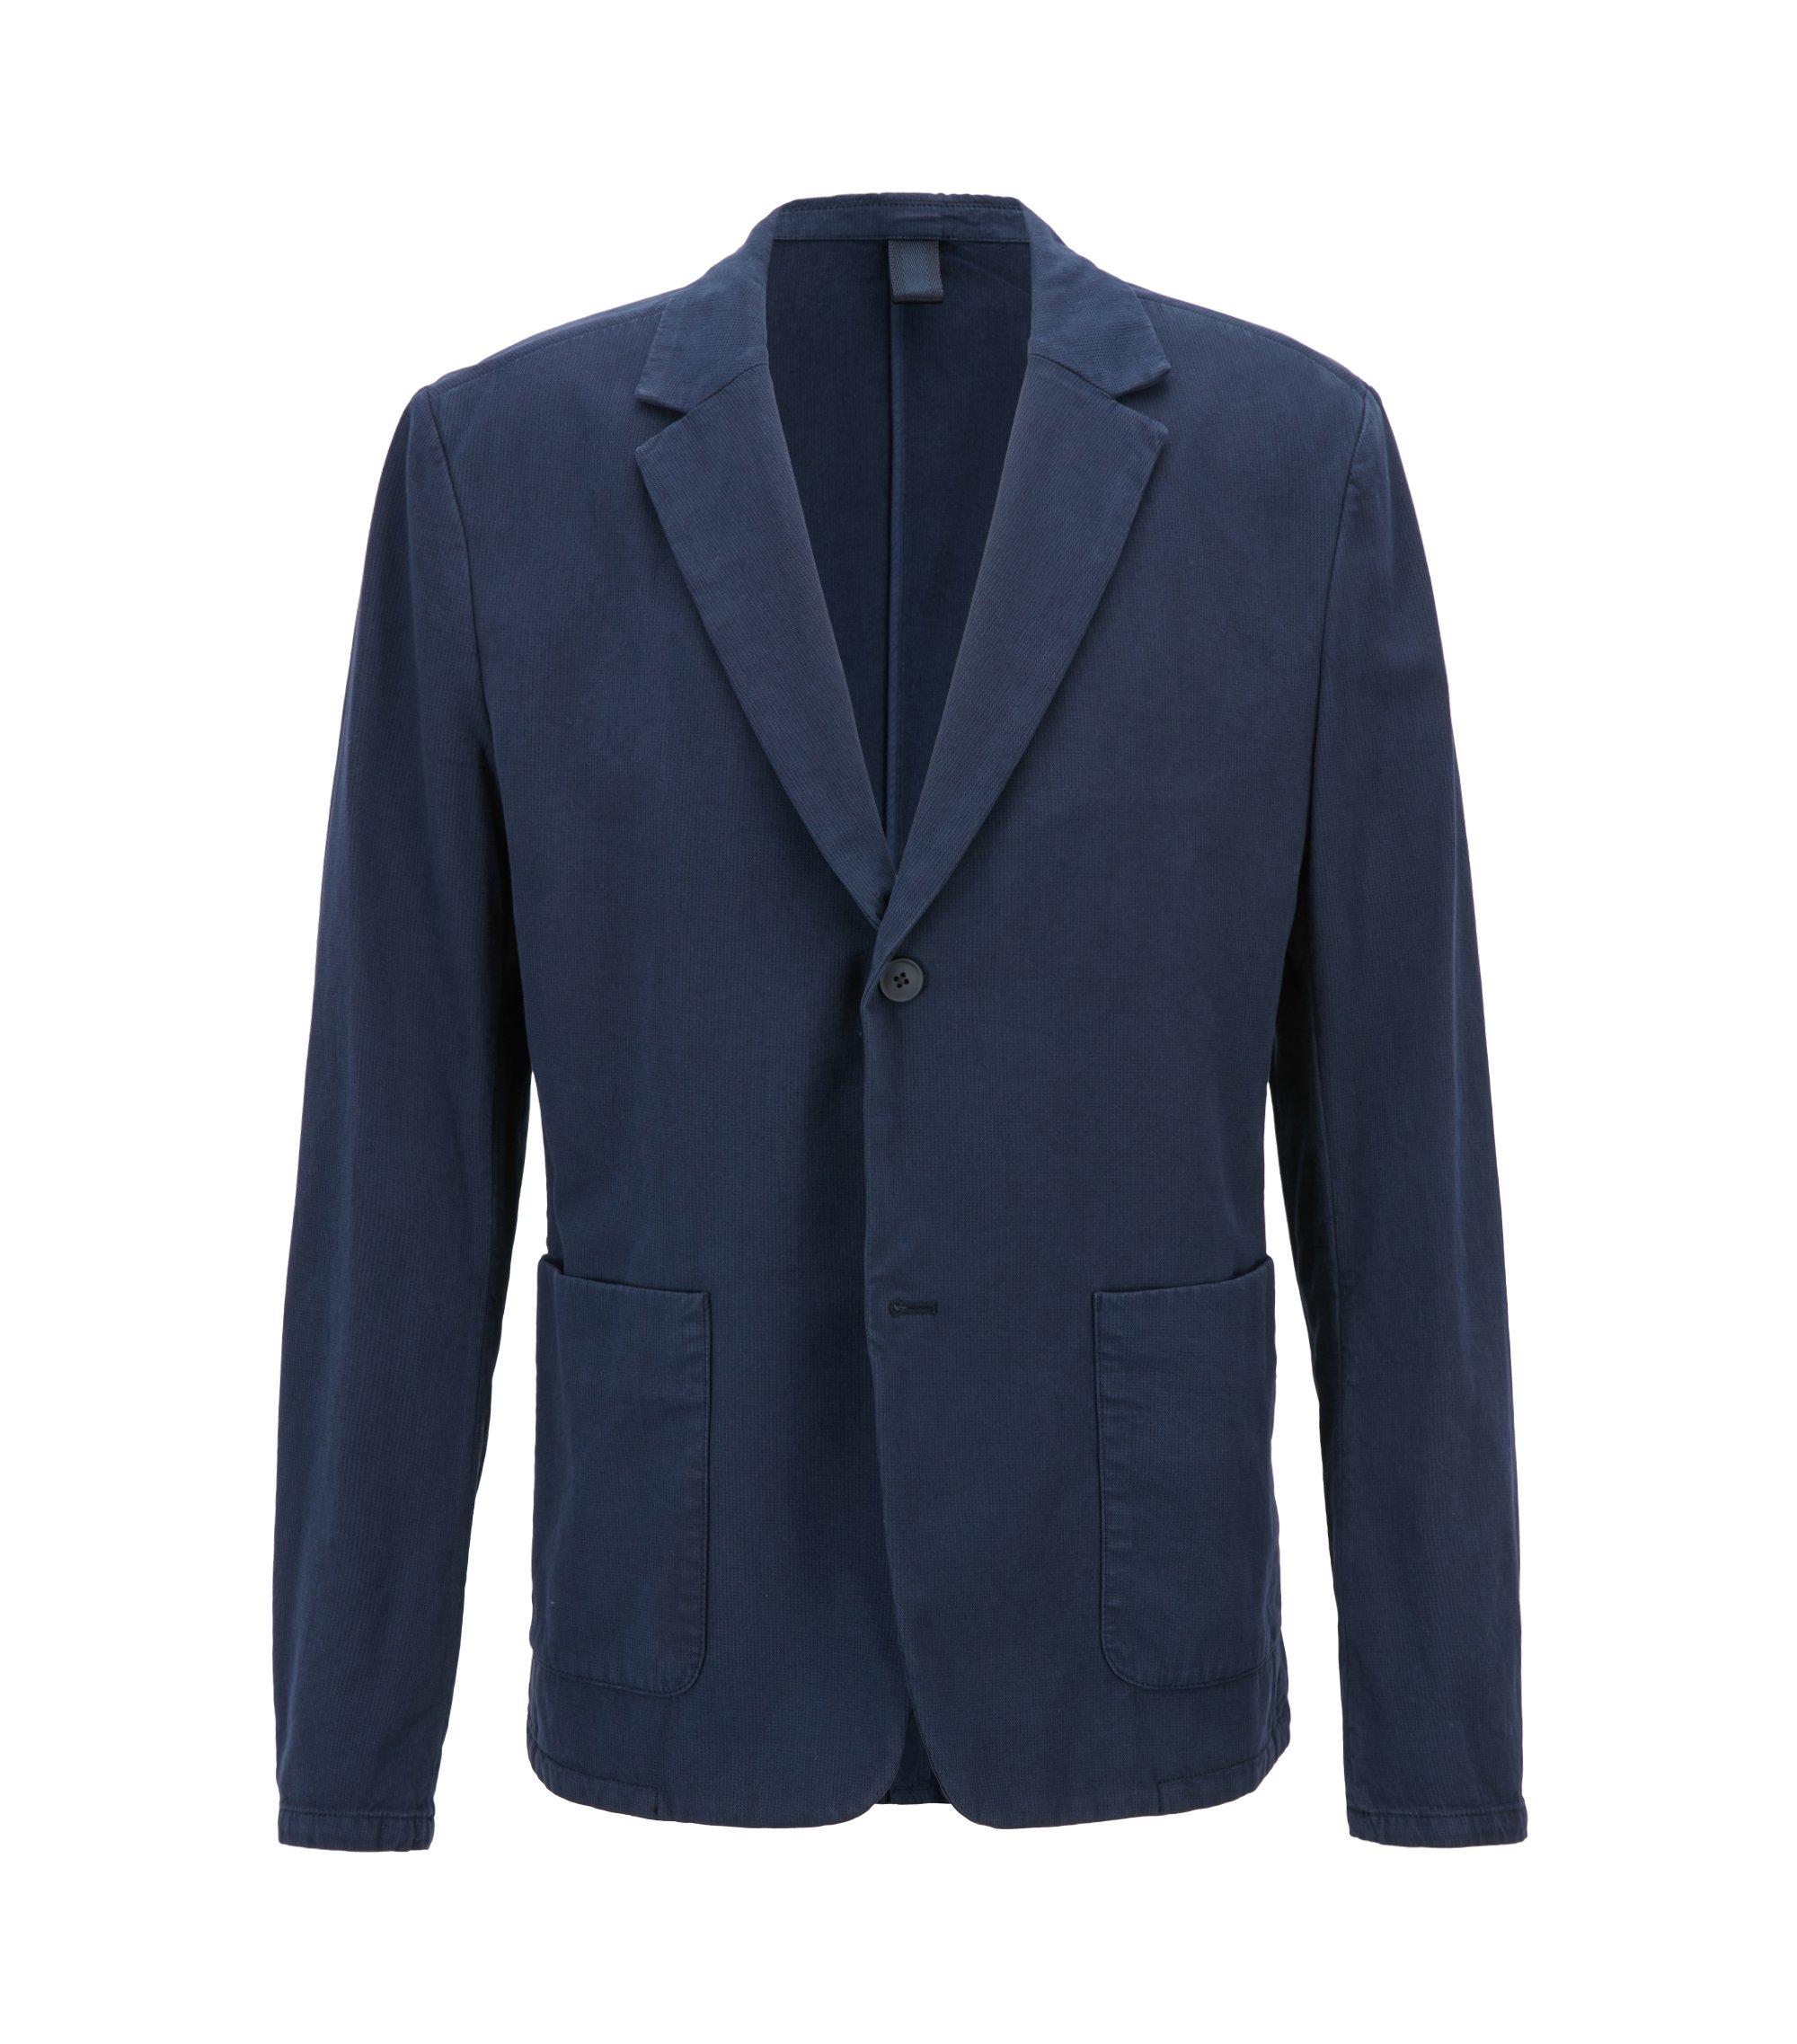 Blazer Slim Fit en coton stretch bicolore, Bleu foncé